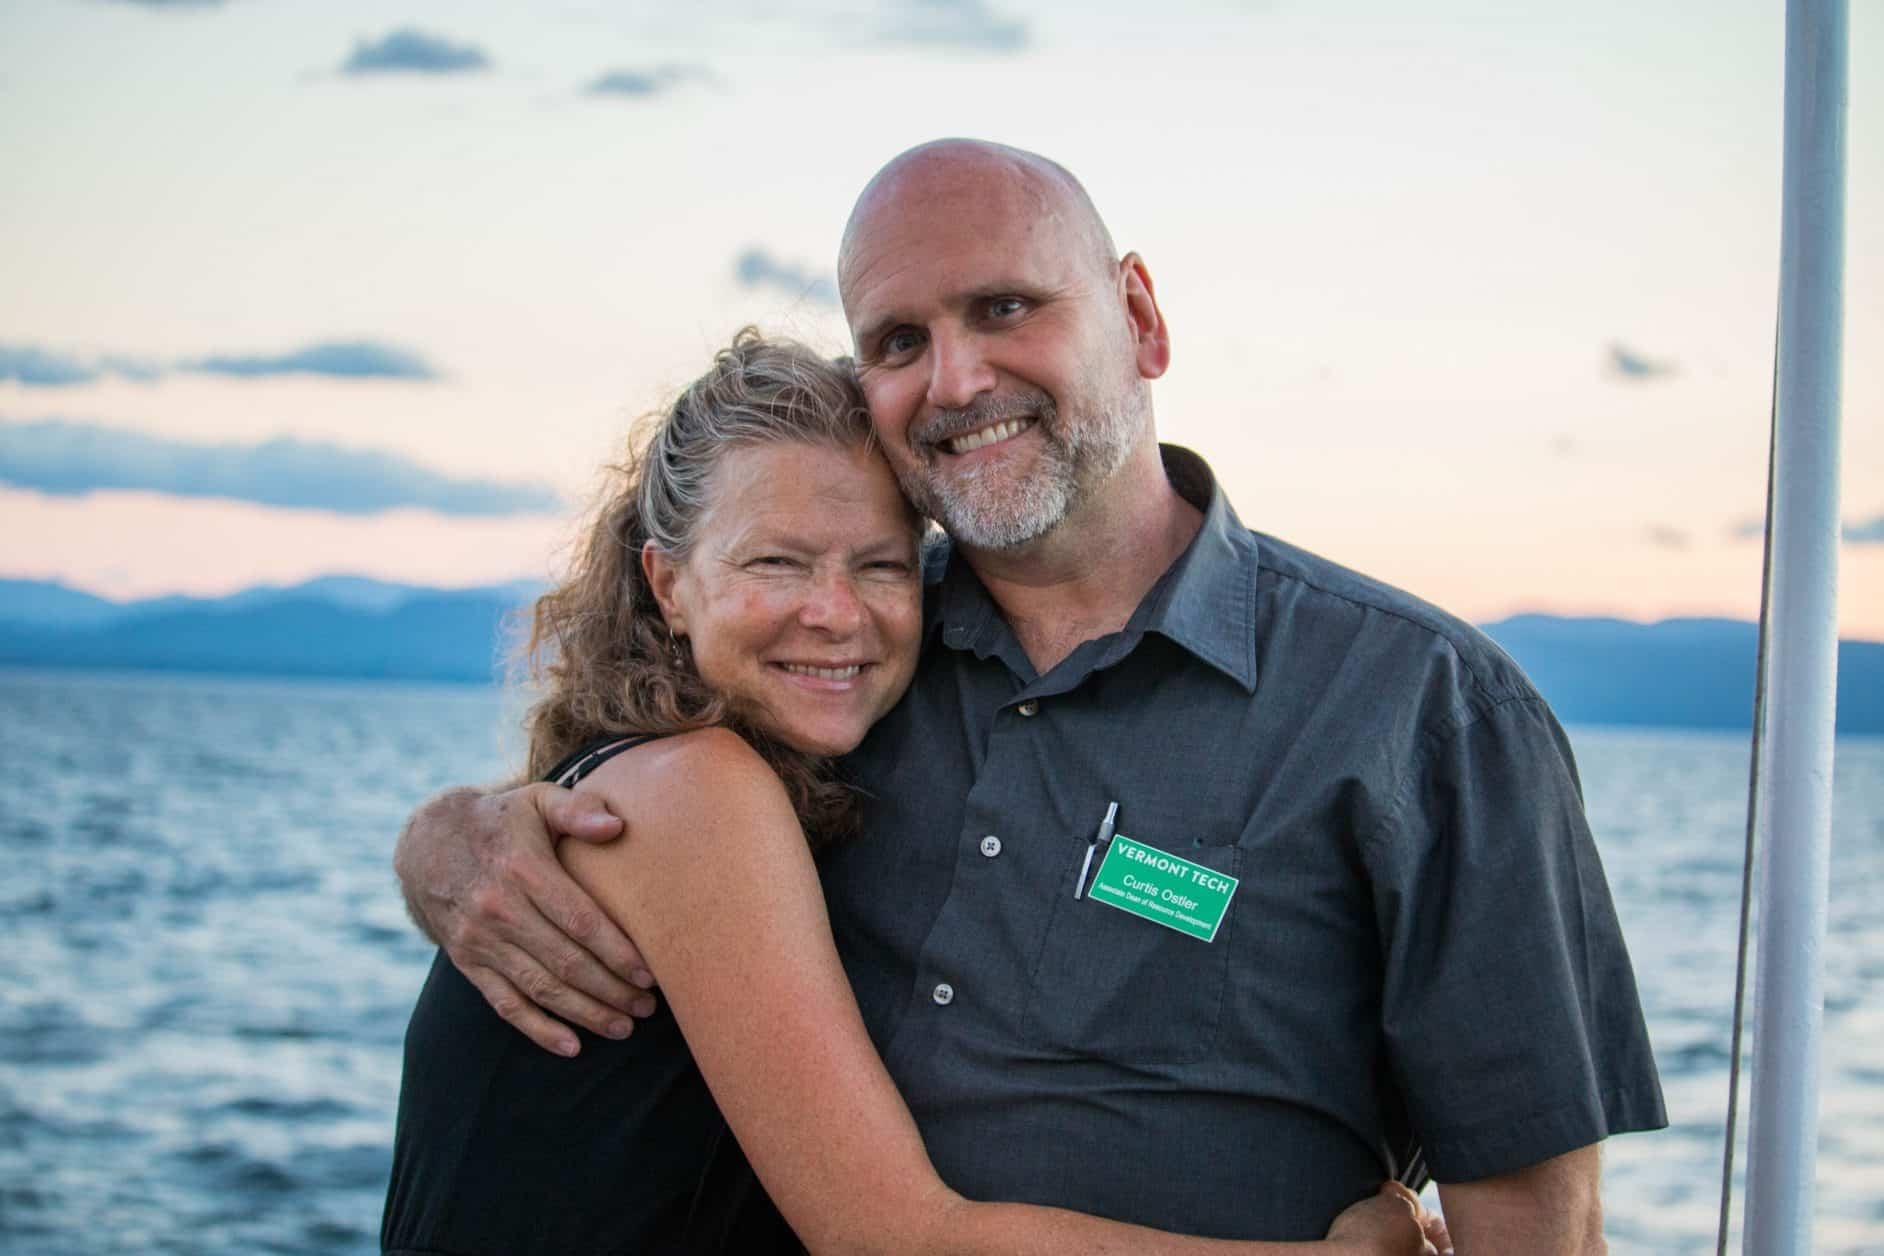 alumni cruise, lake champlain, burlington, Vermont, smiling, couple posing